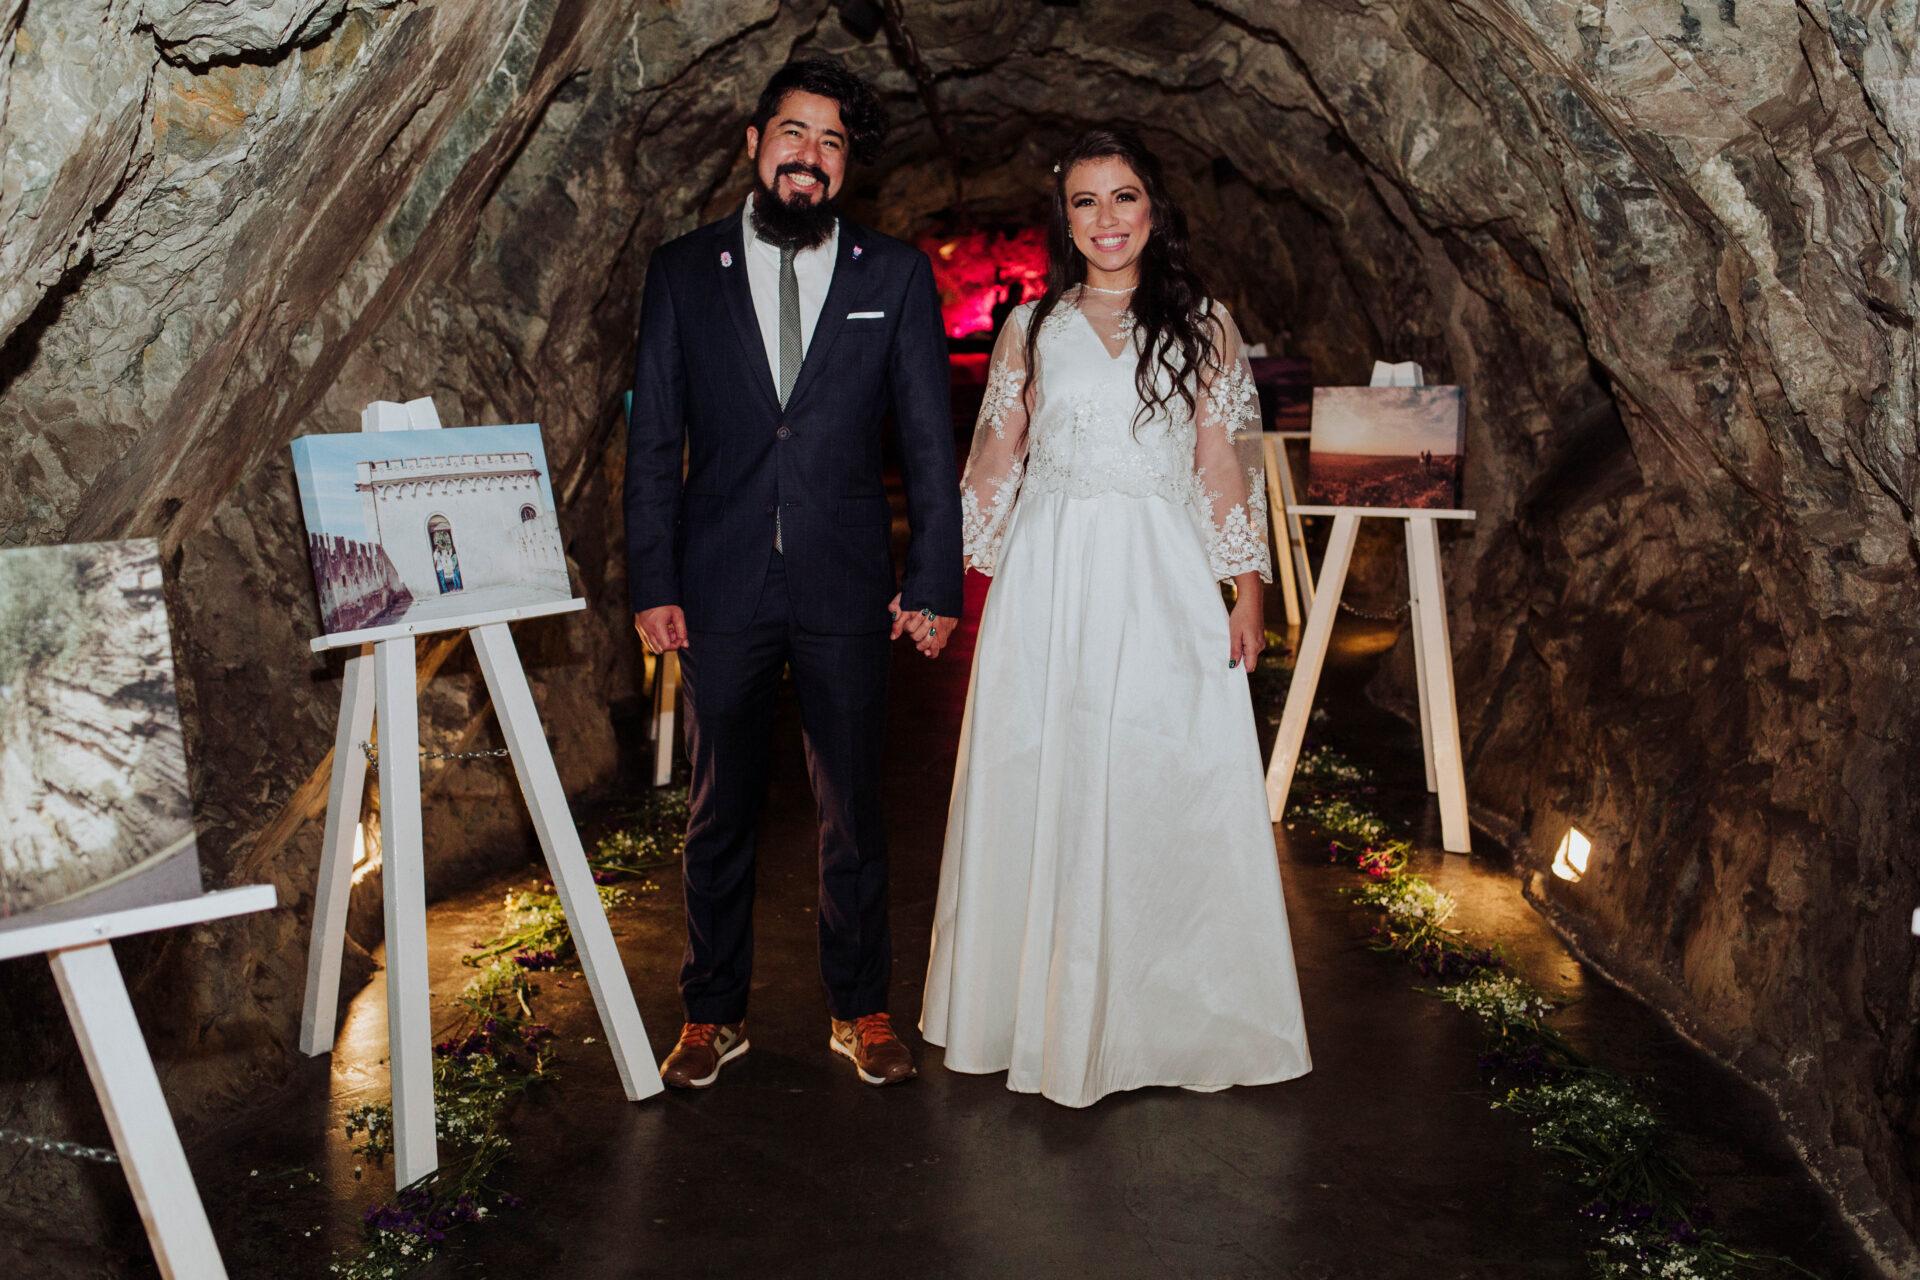 javier_noriega_fotografo_bodas_la_mina_club_zacatecas_wedding_photographer9